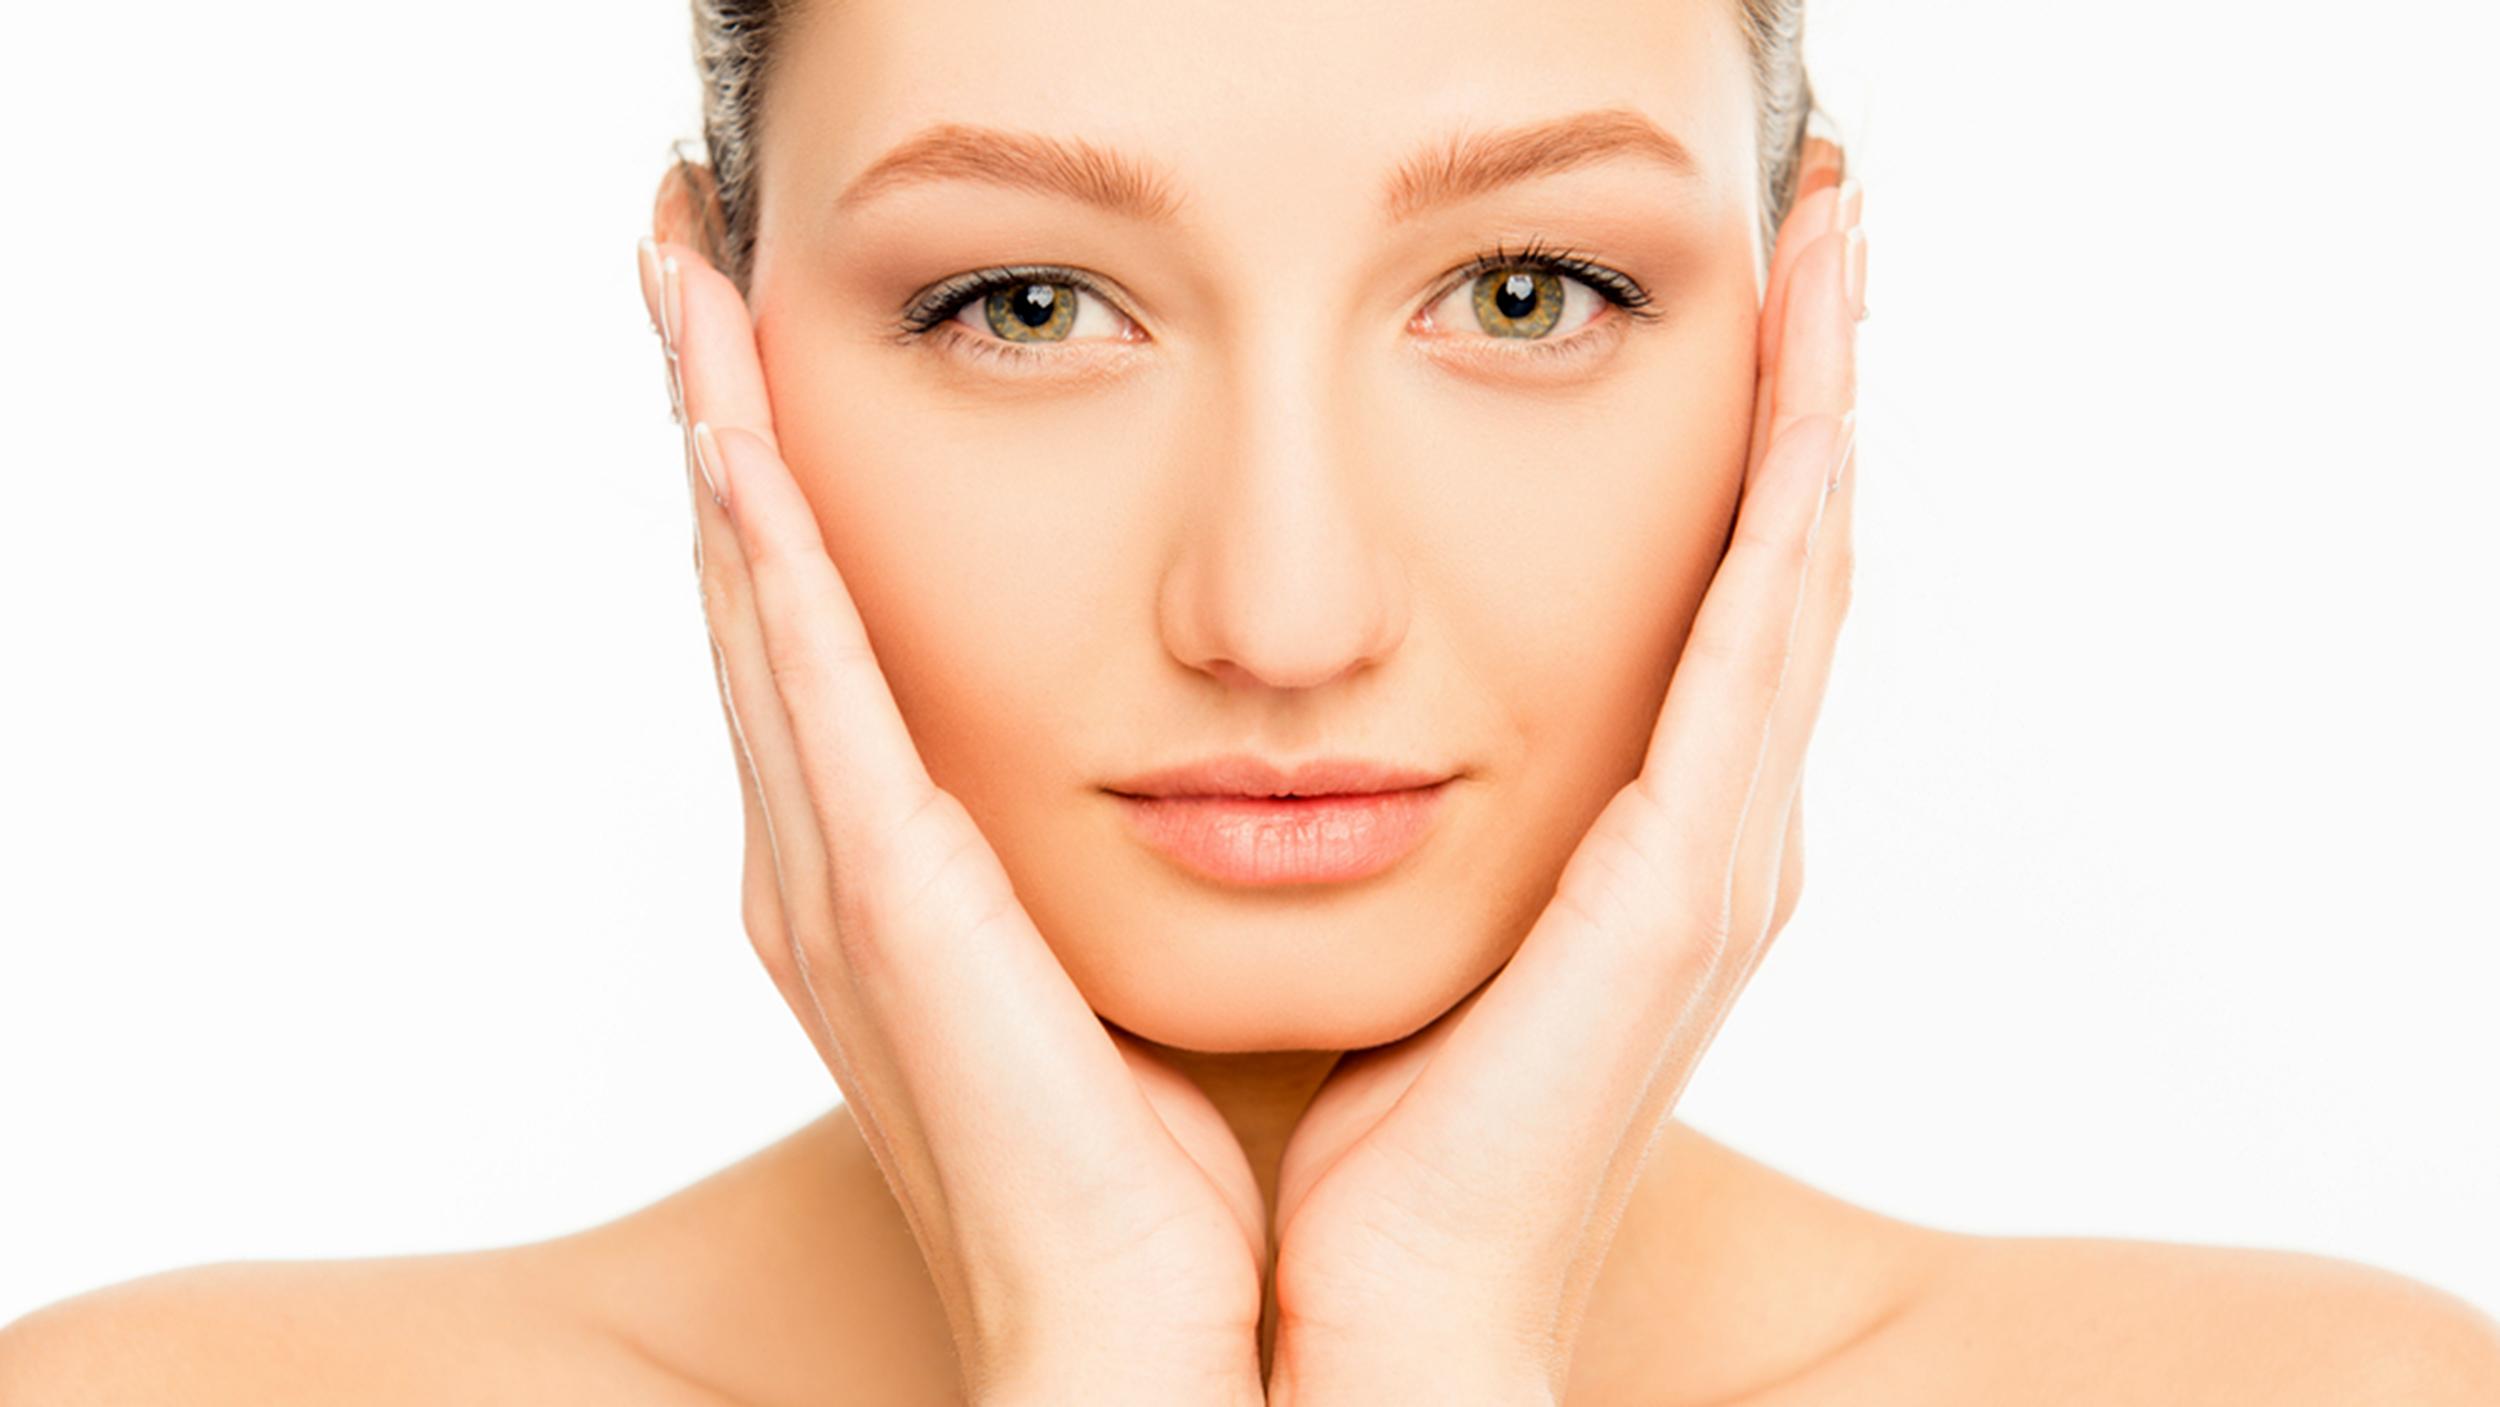 Very sensitive facial skin